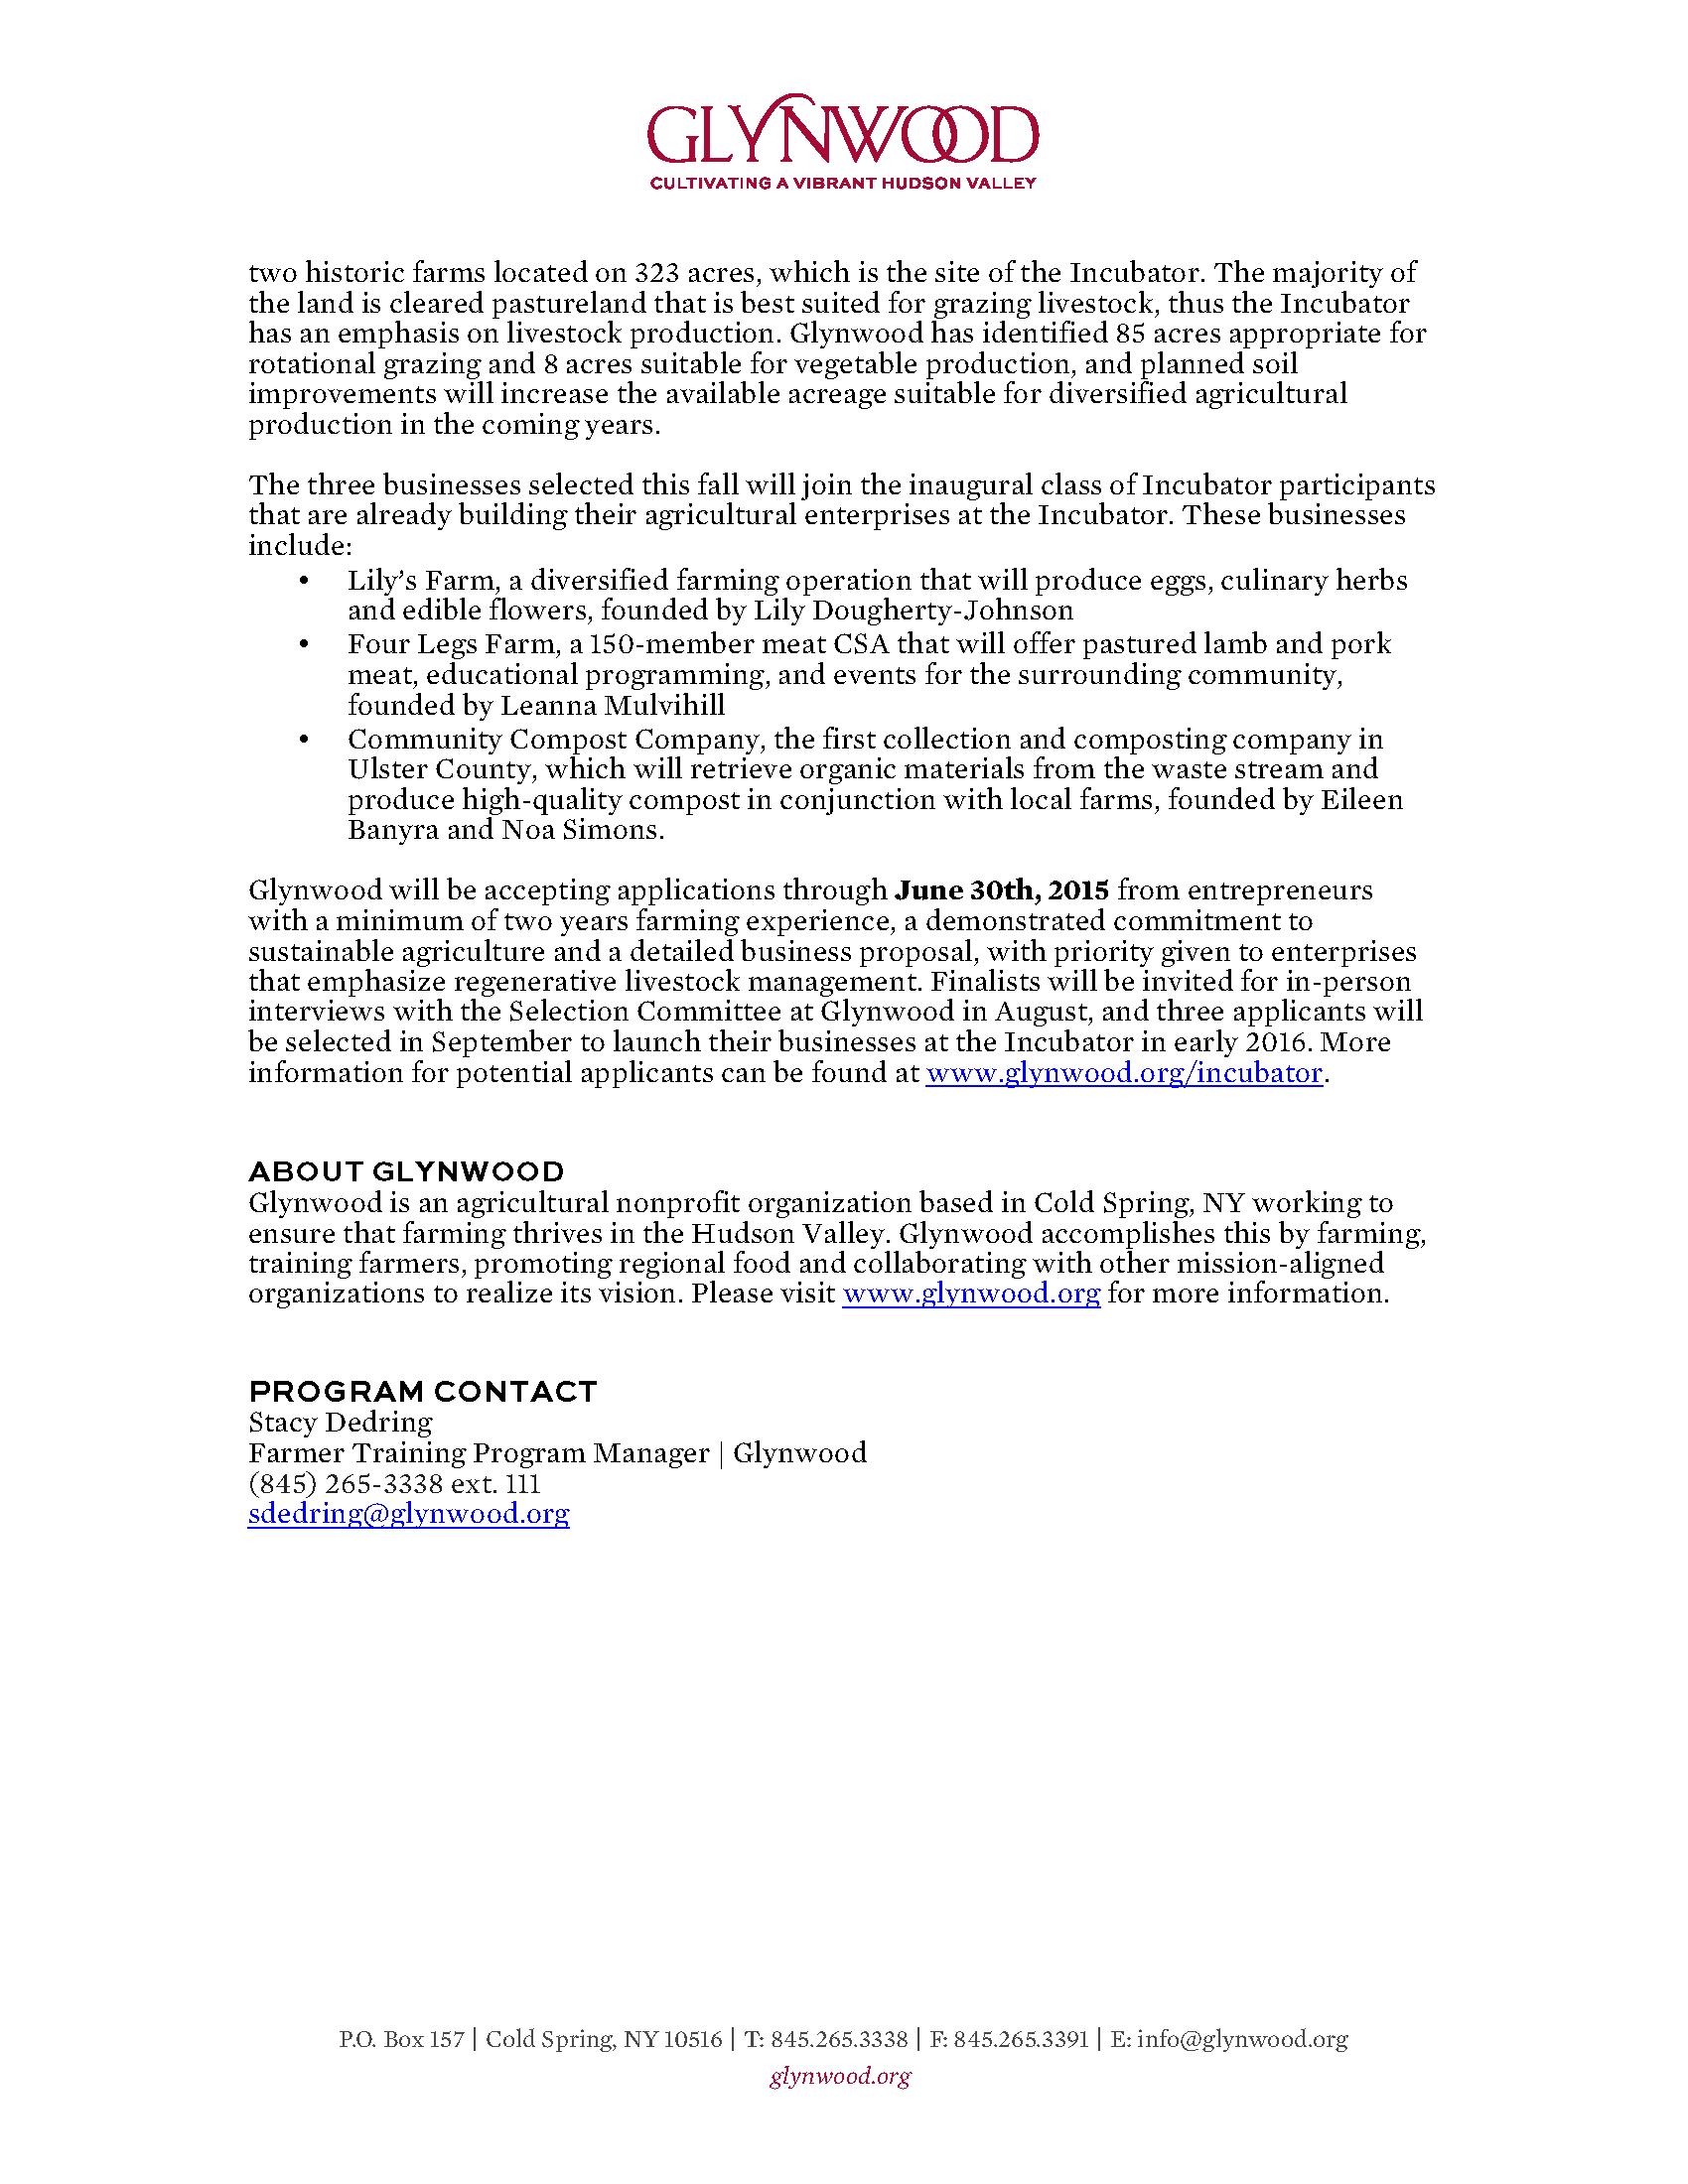 Incubator RFP - February 2015_Page_2